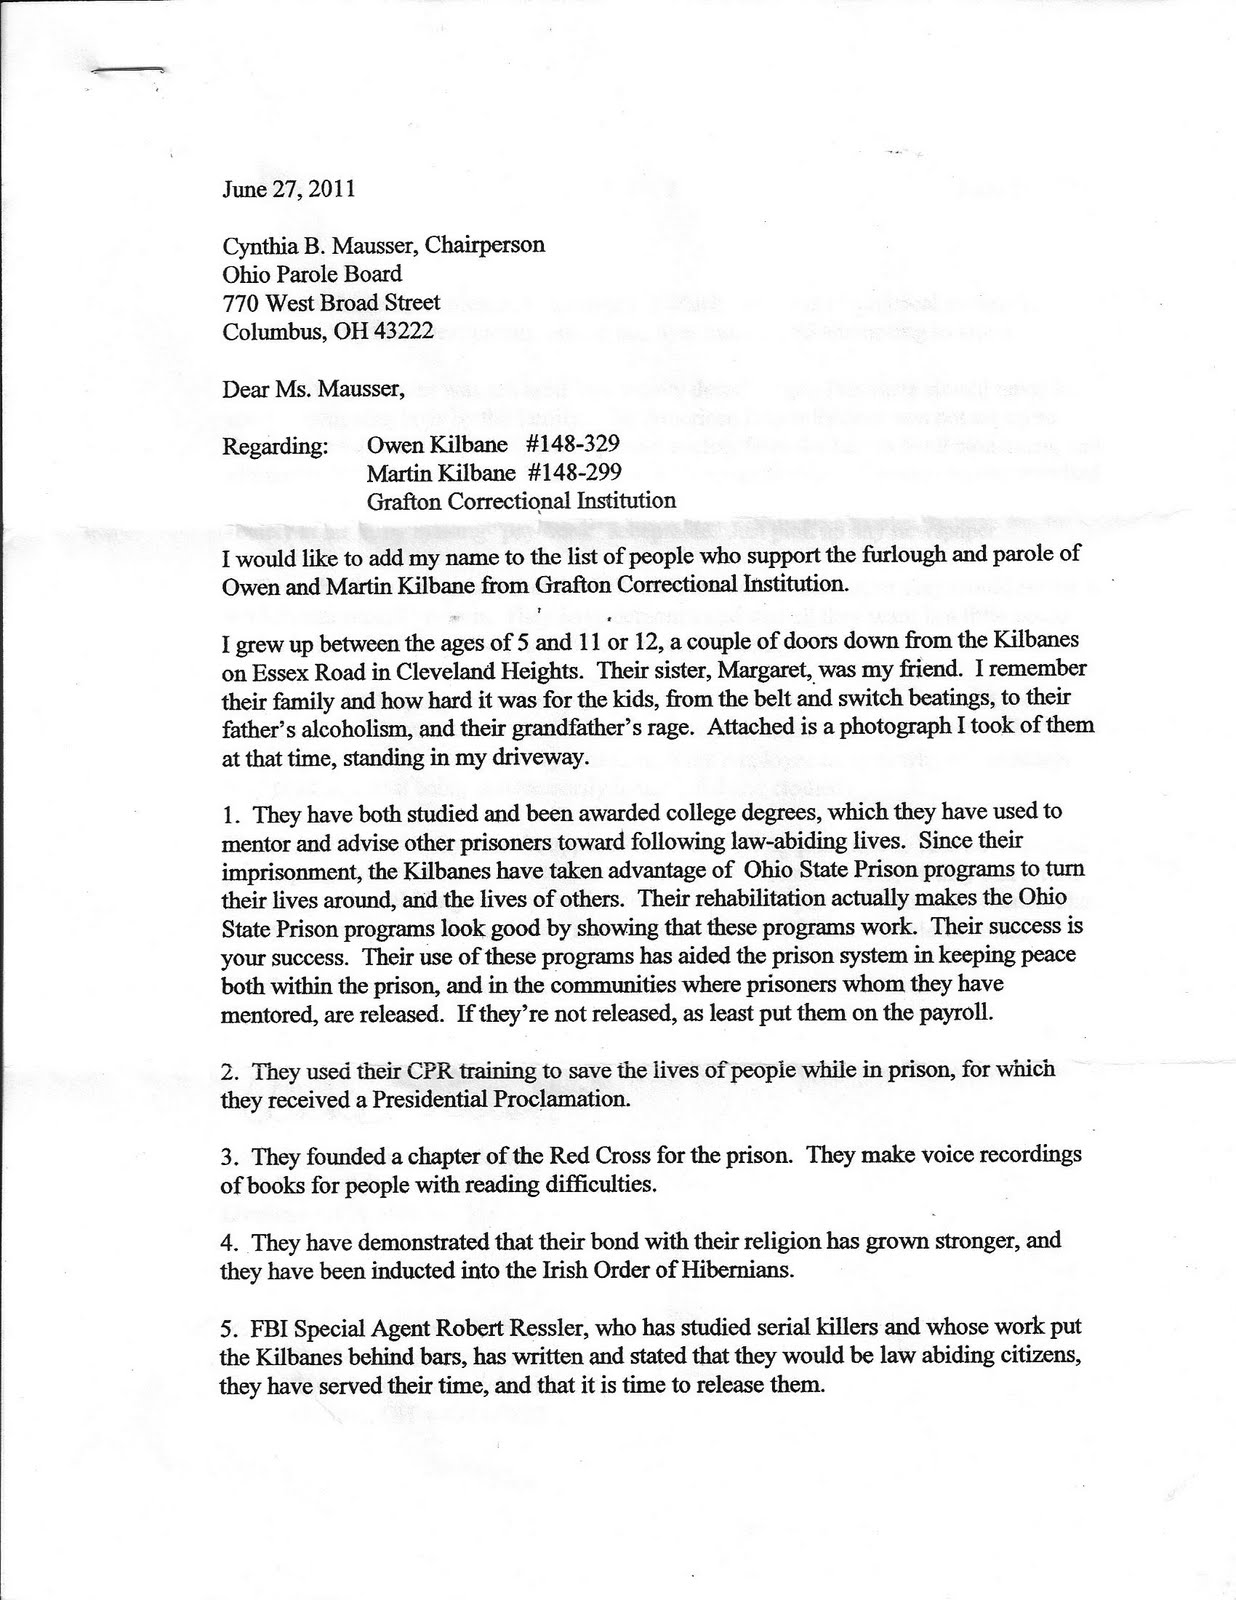 Pg 1 of letter to Parole board from childhood friend Anne Stuart